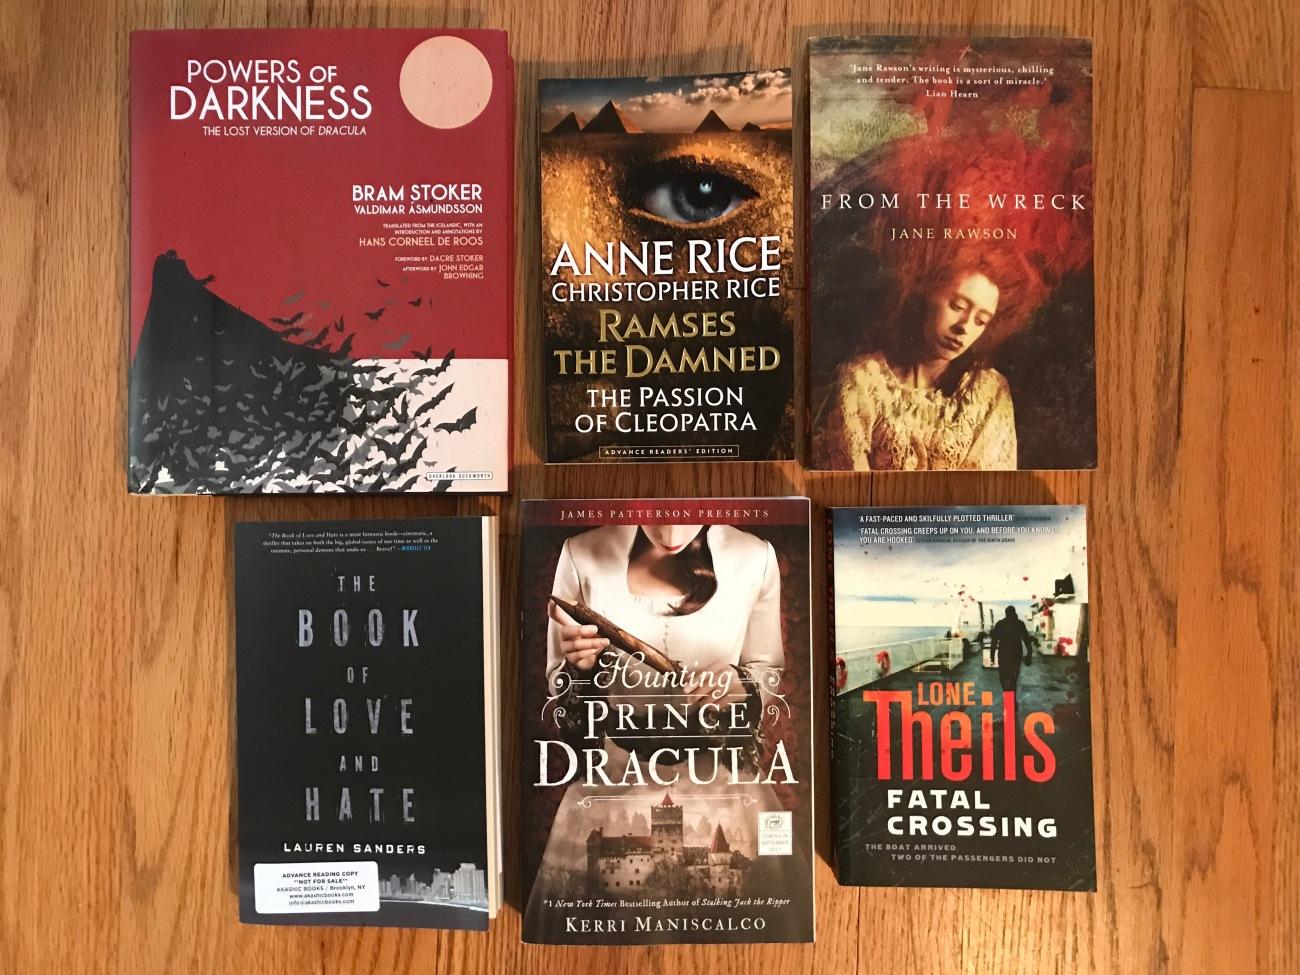 #RIPXII TBR Covers (WildmooBooks.com)